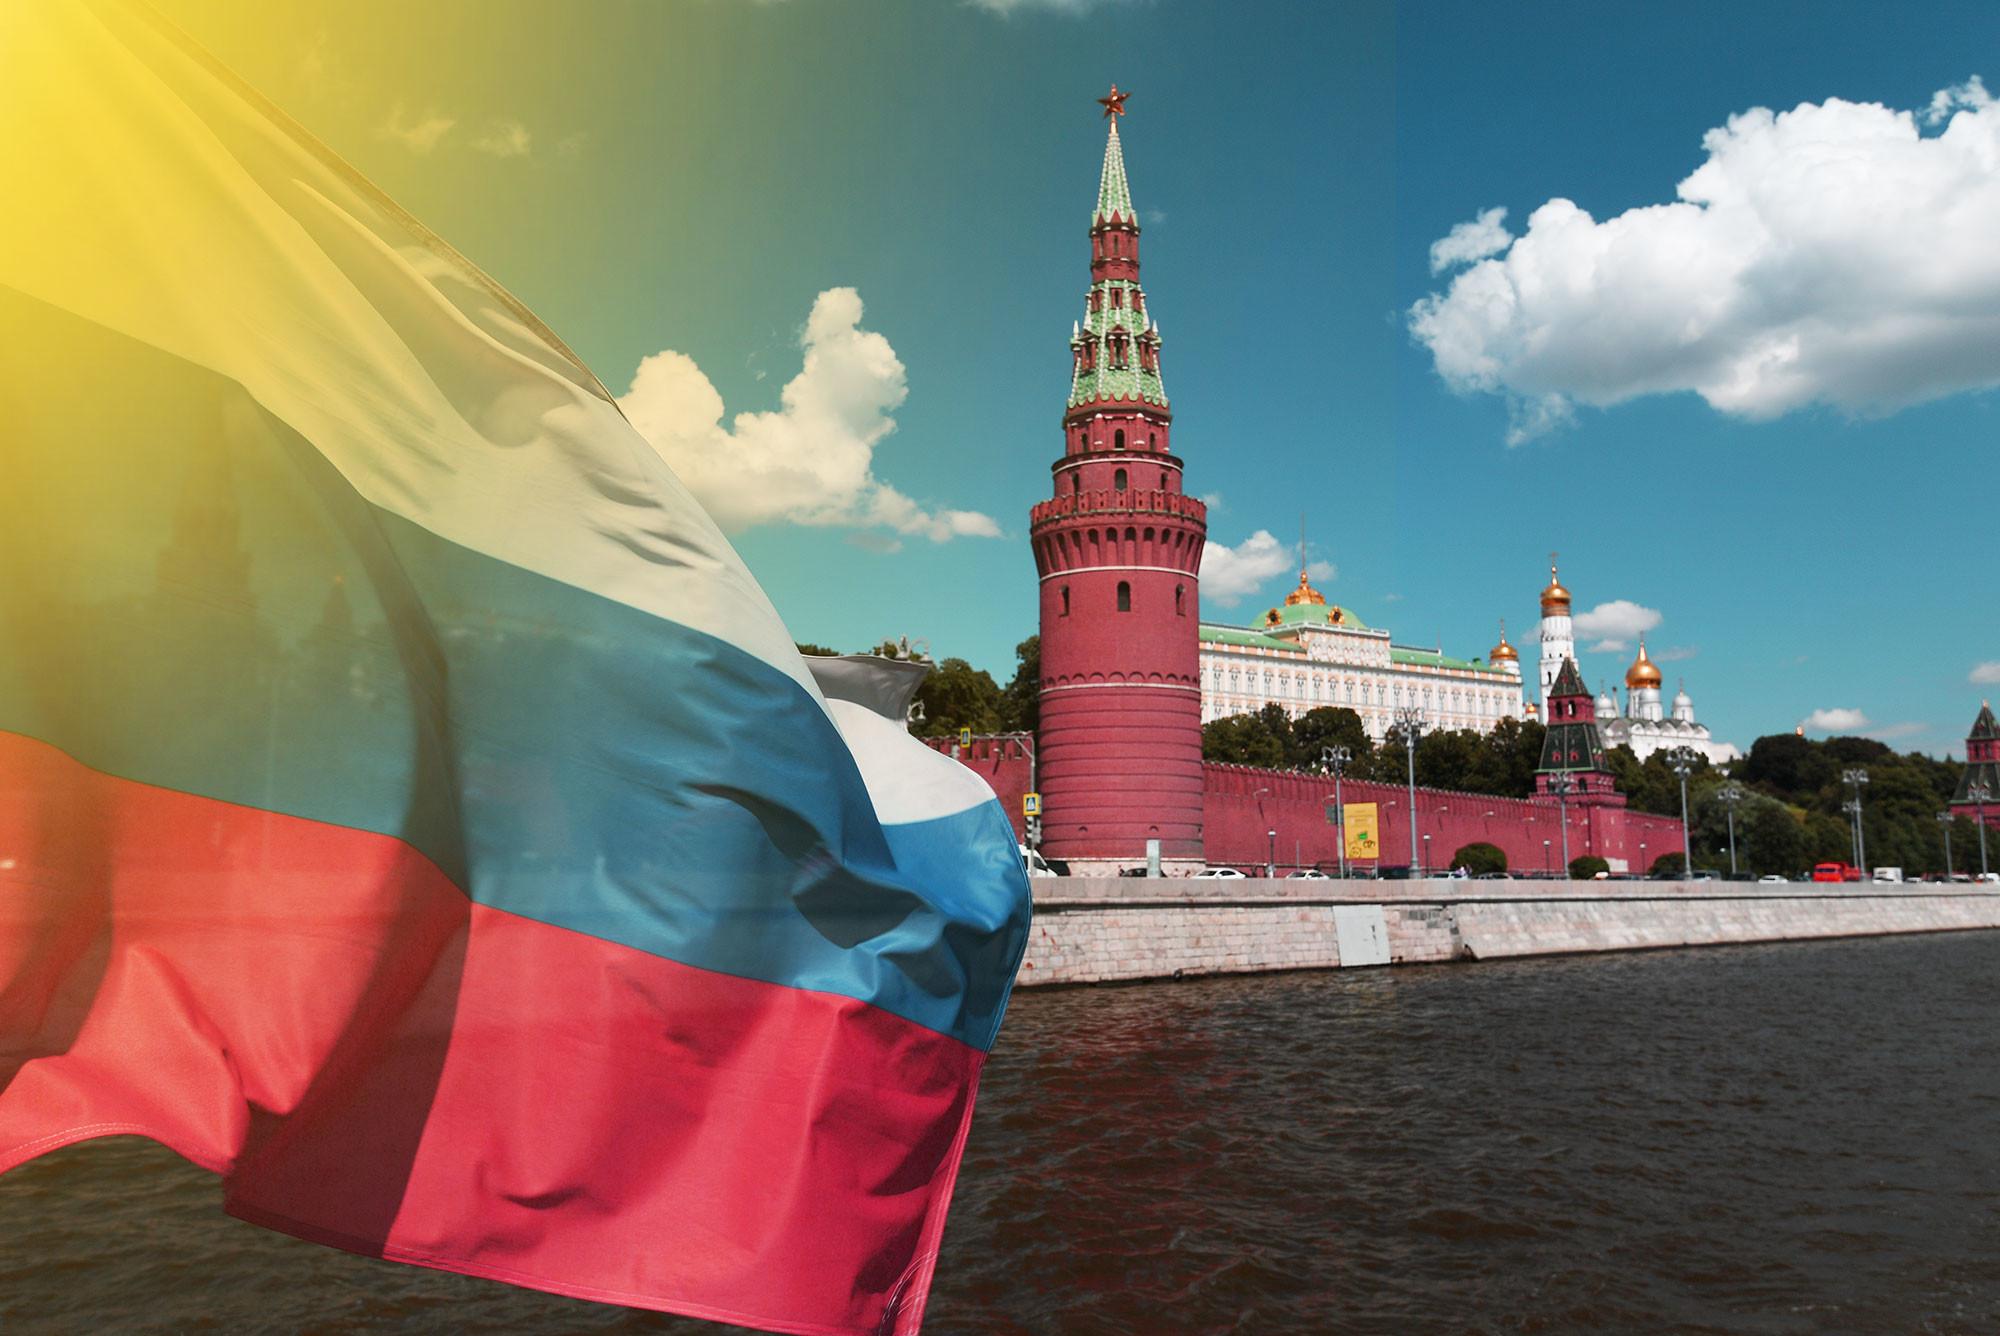 <p>Фото: &copy; РИА Новости /&nbsp;Владимир Вяткин</p>